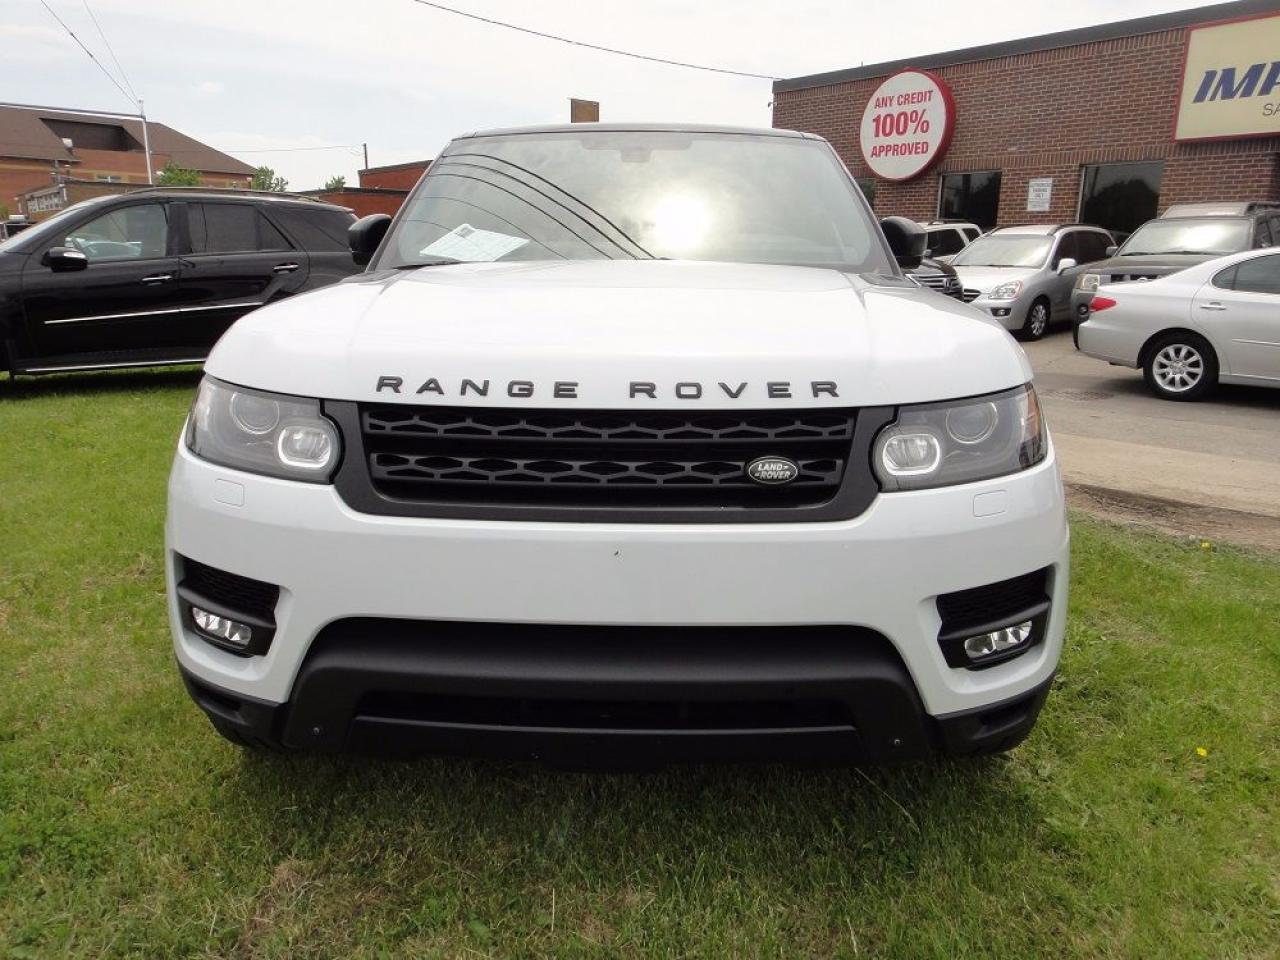 2015 Land Rover Range Rover V8 SC Dynamic,SUPER CHARGE,MINT